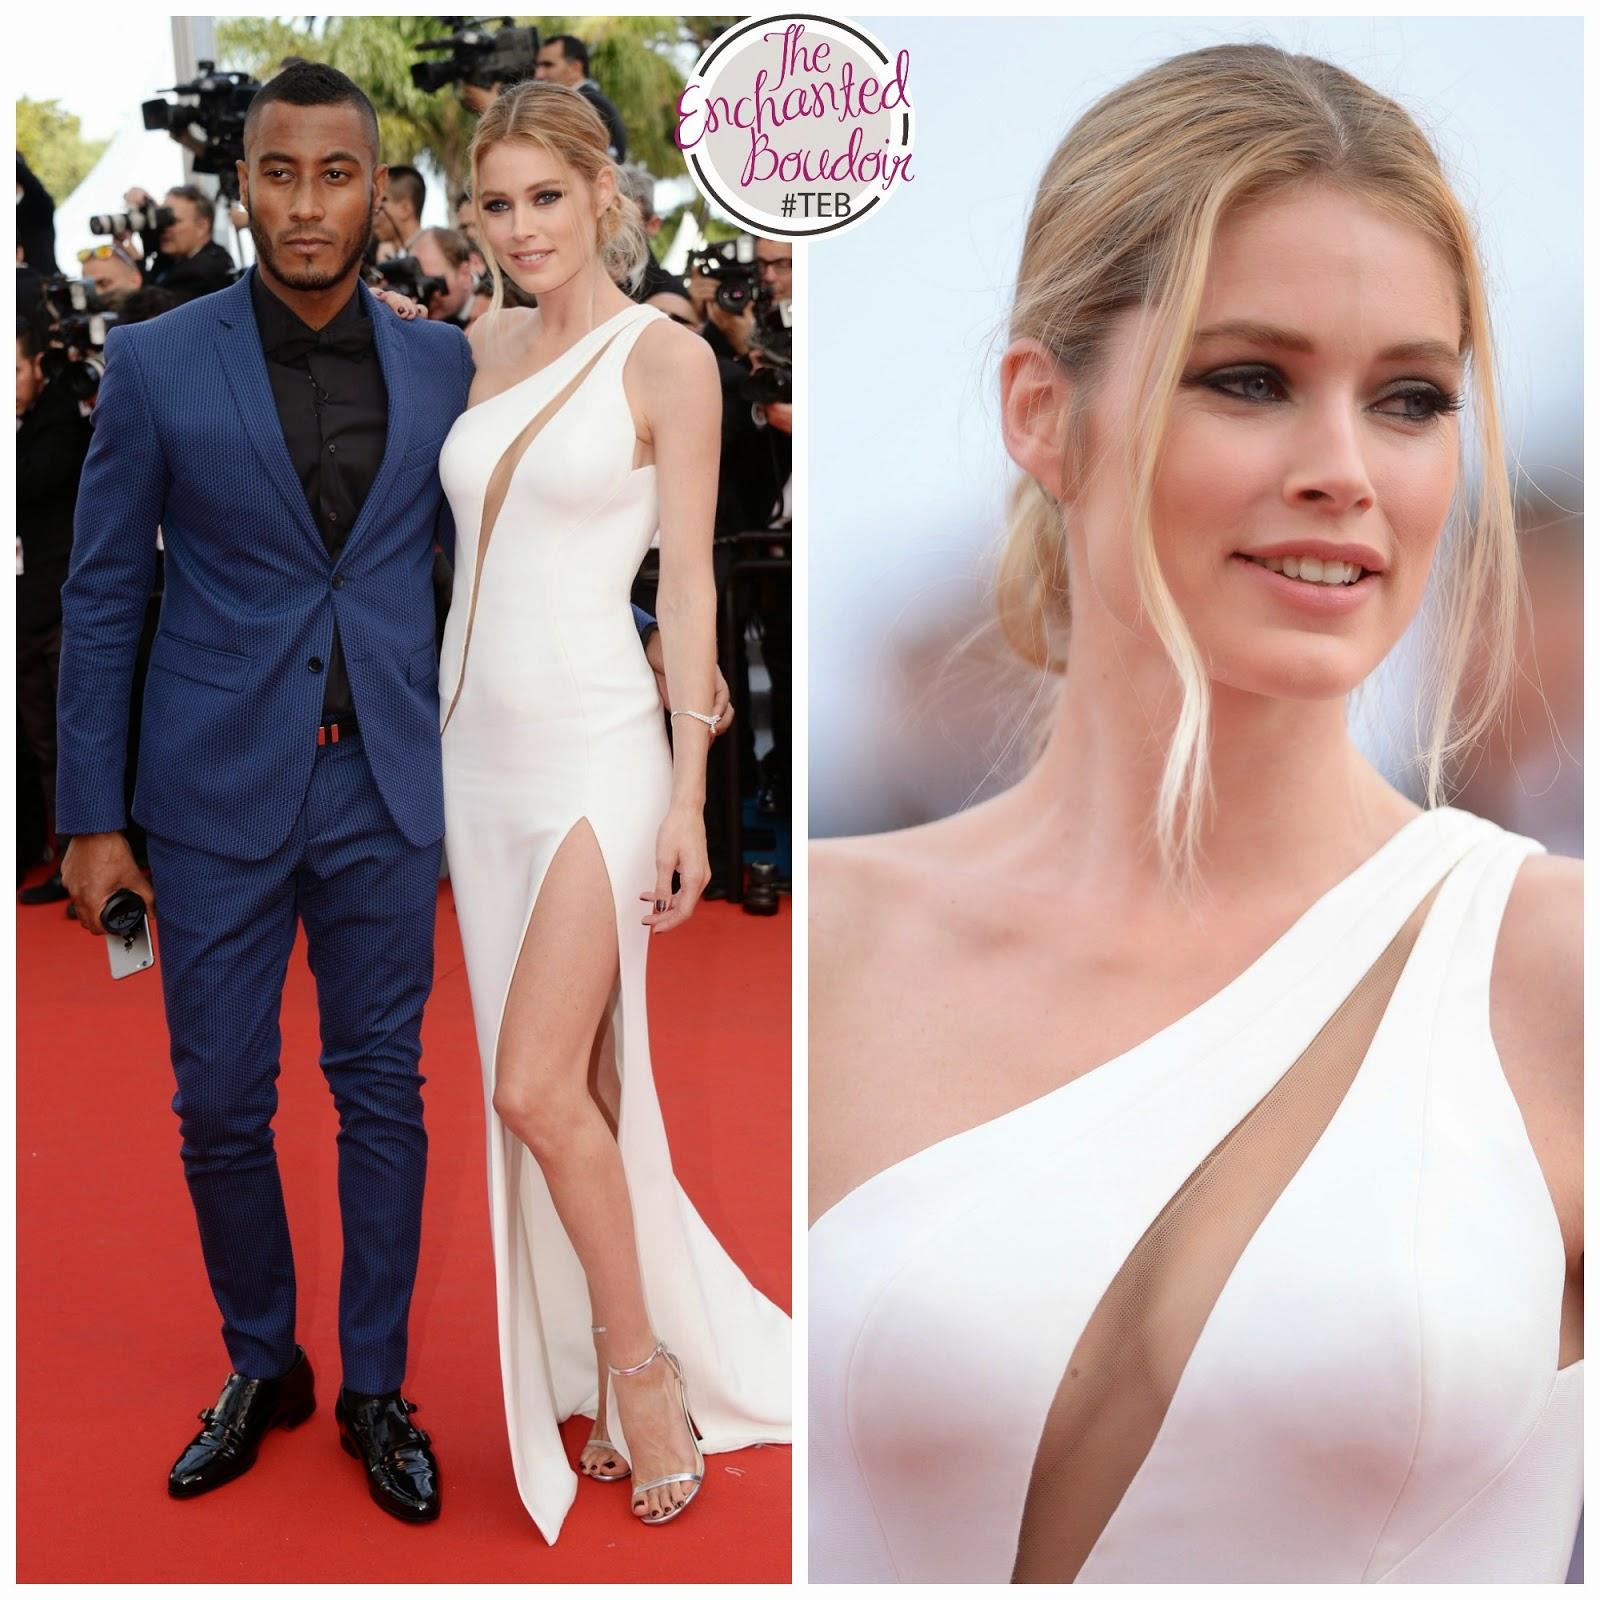 Models Cannes Festival Red Carpet